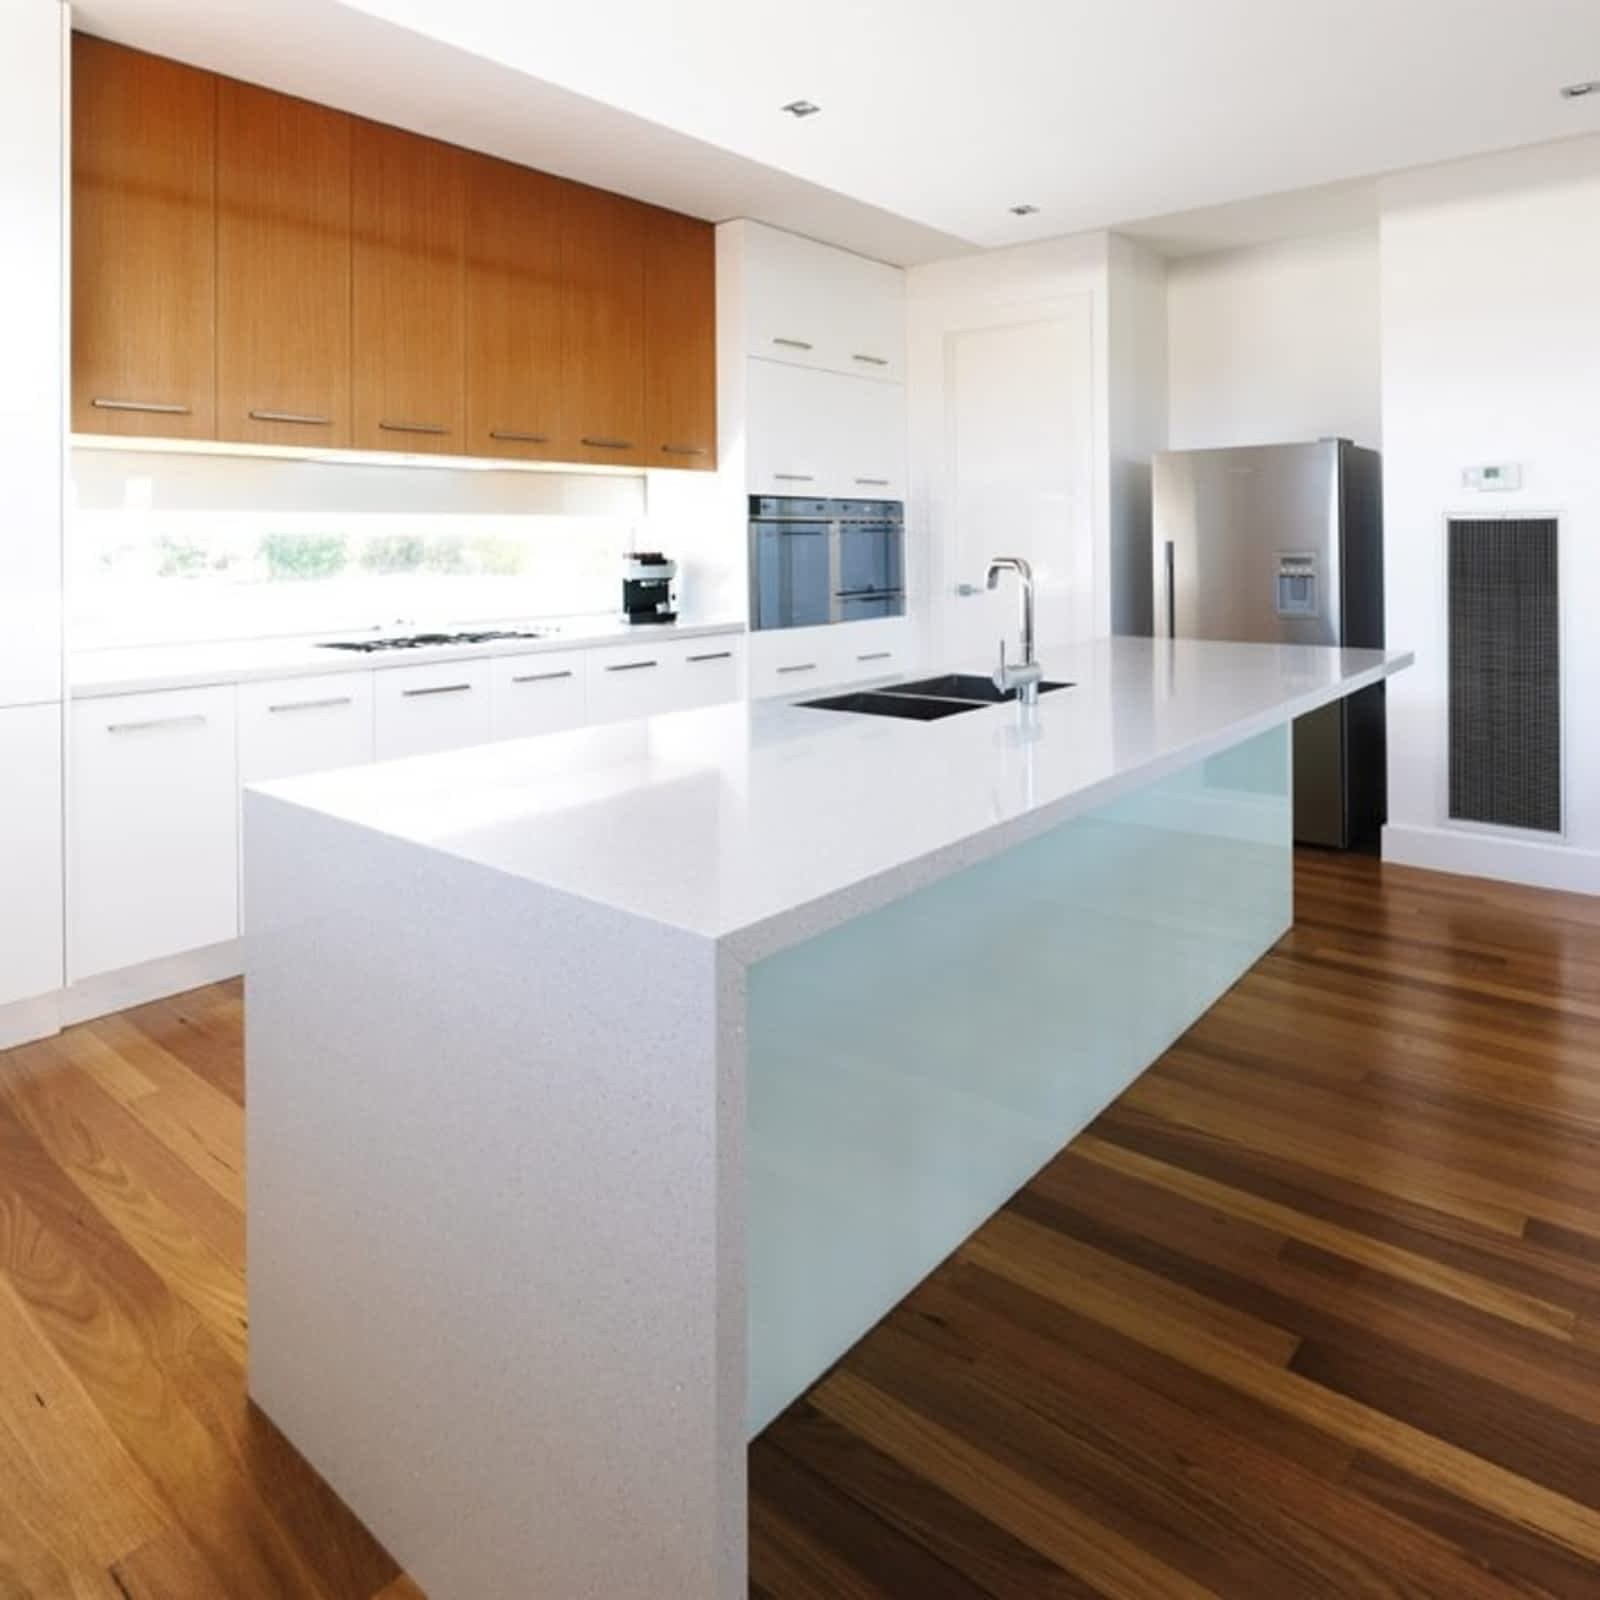 gallery remodel melbourne countertops custom marsh furniture cabinets brevard hammond florida bath and kitchen showroom